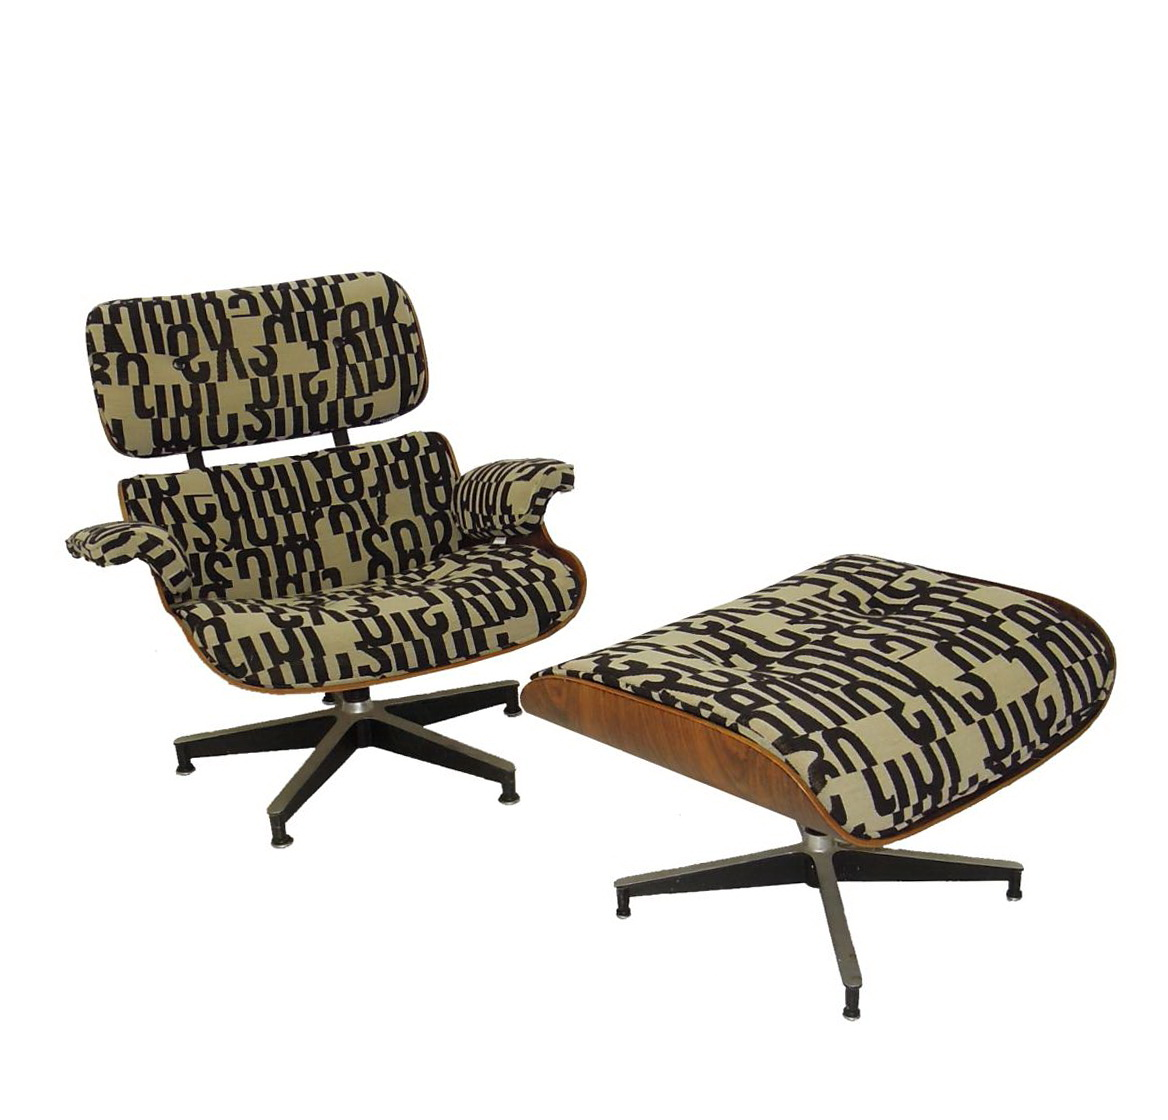 Eames Lounge Chair And Ottoman Craigslist Home Design Ideas